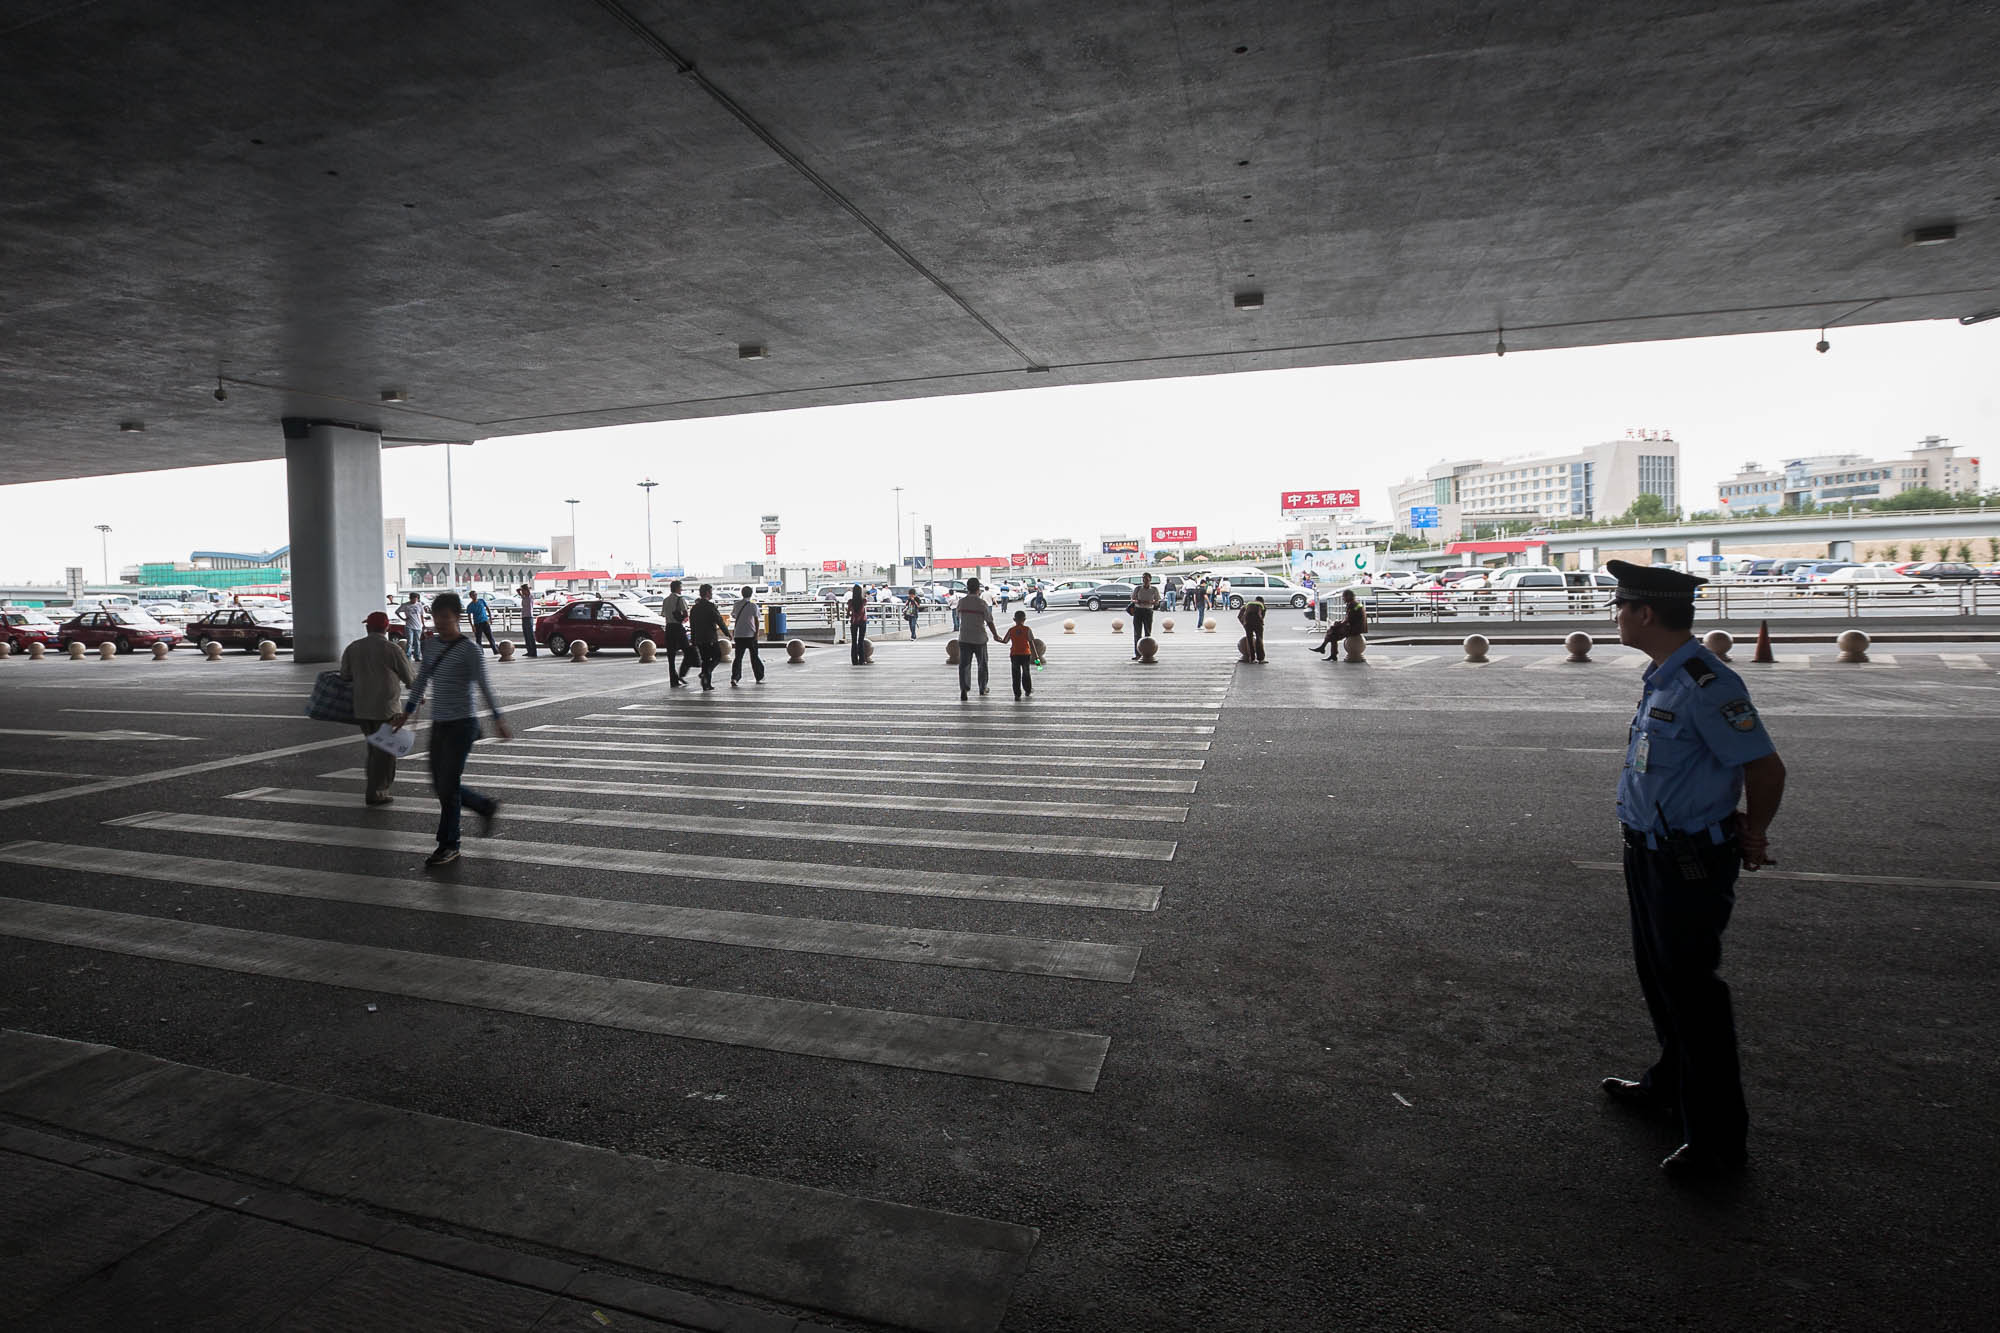 Ürümqi airport